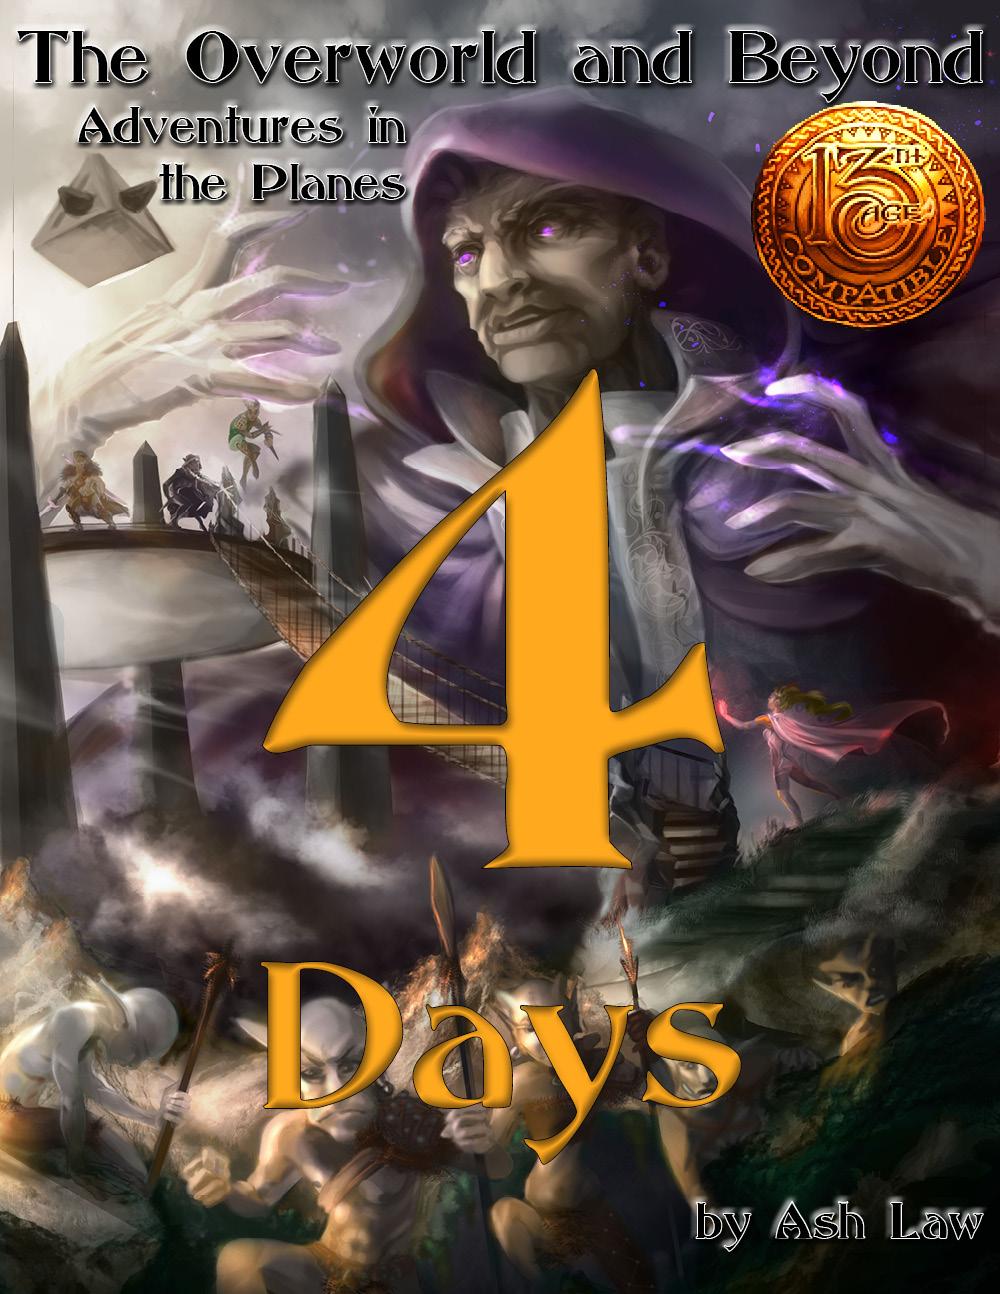 Countdown Cover 4.jpg